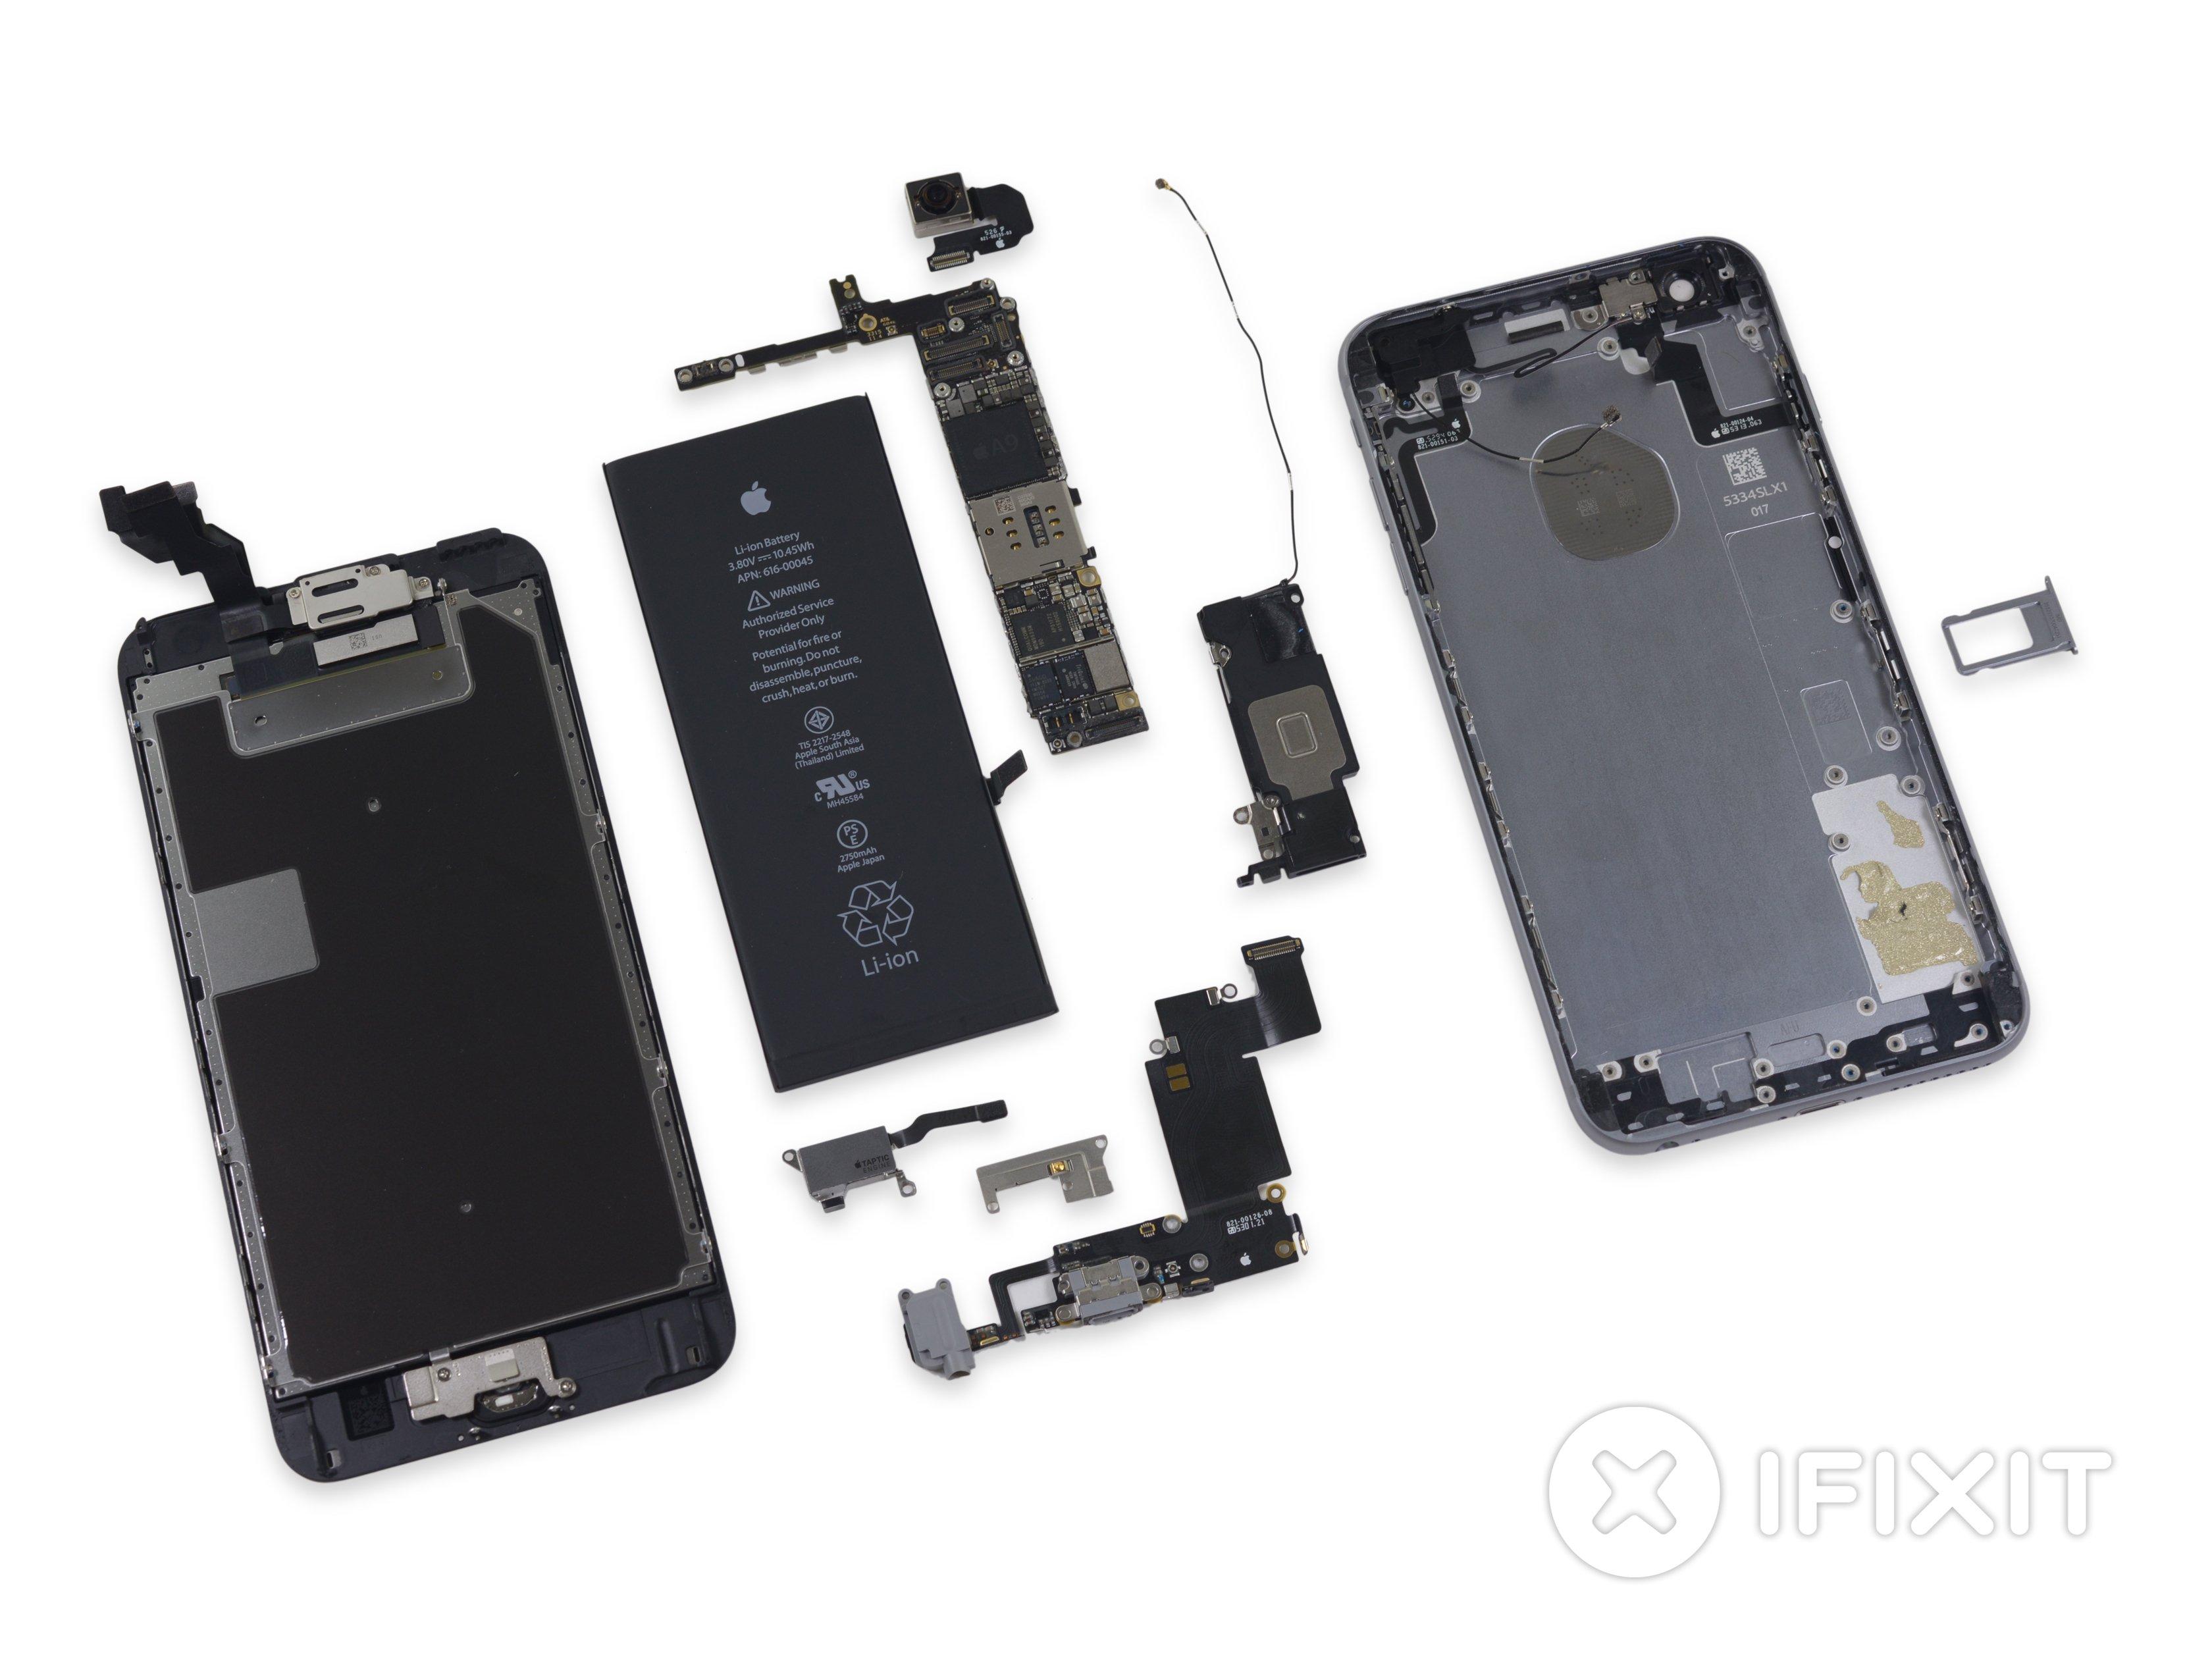 iPhone 6s Plus Teardown